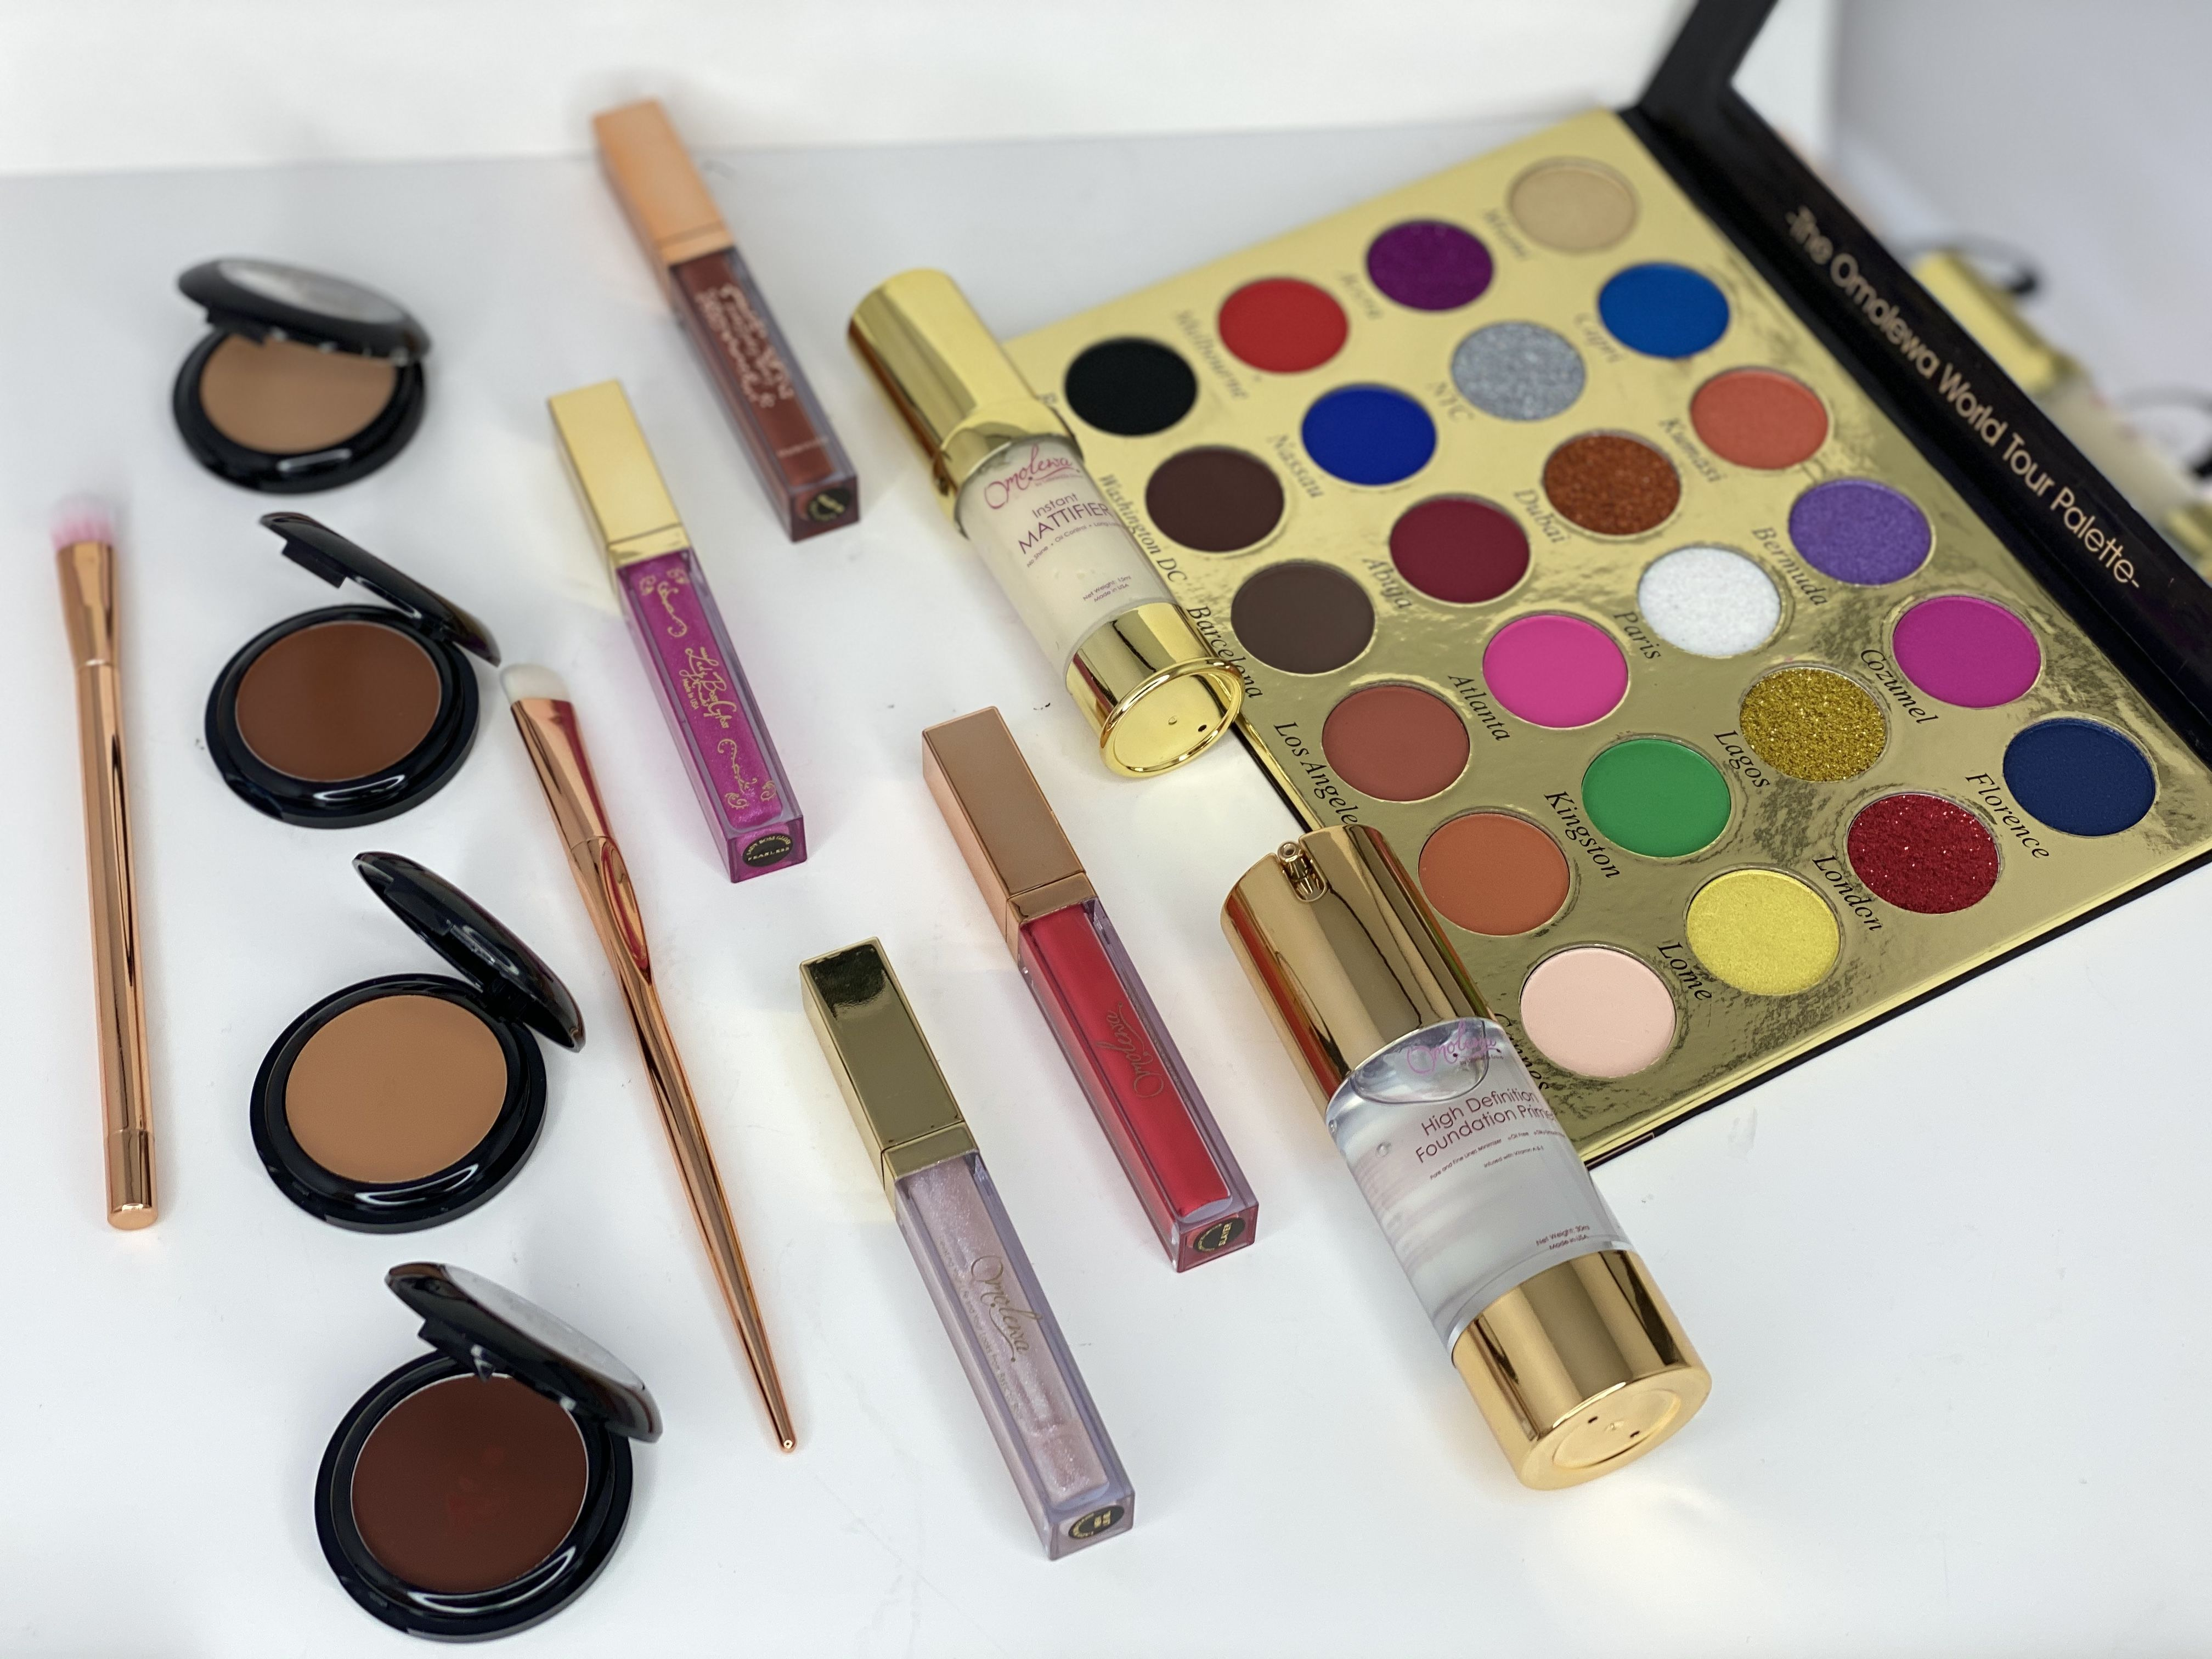 Cruelty Free Black Owned Makeup brand. Omolewa Cosmetics